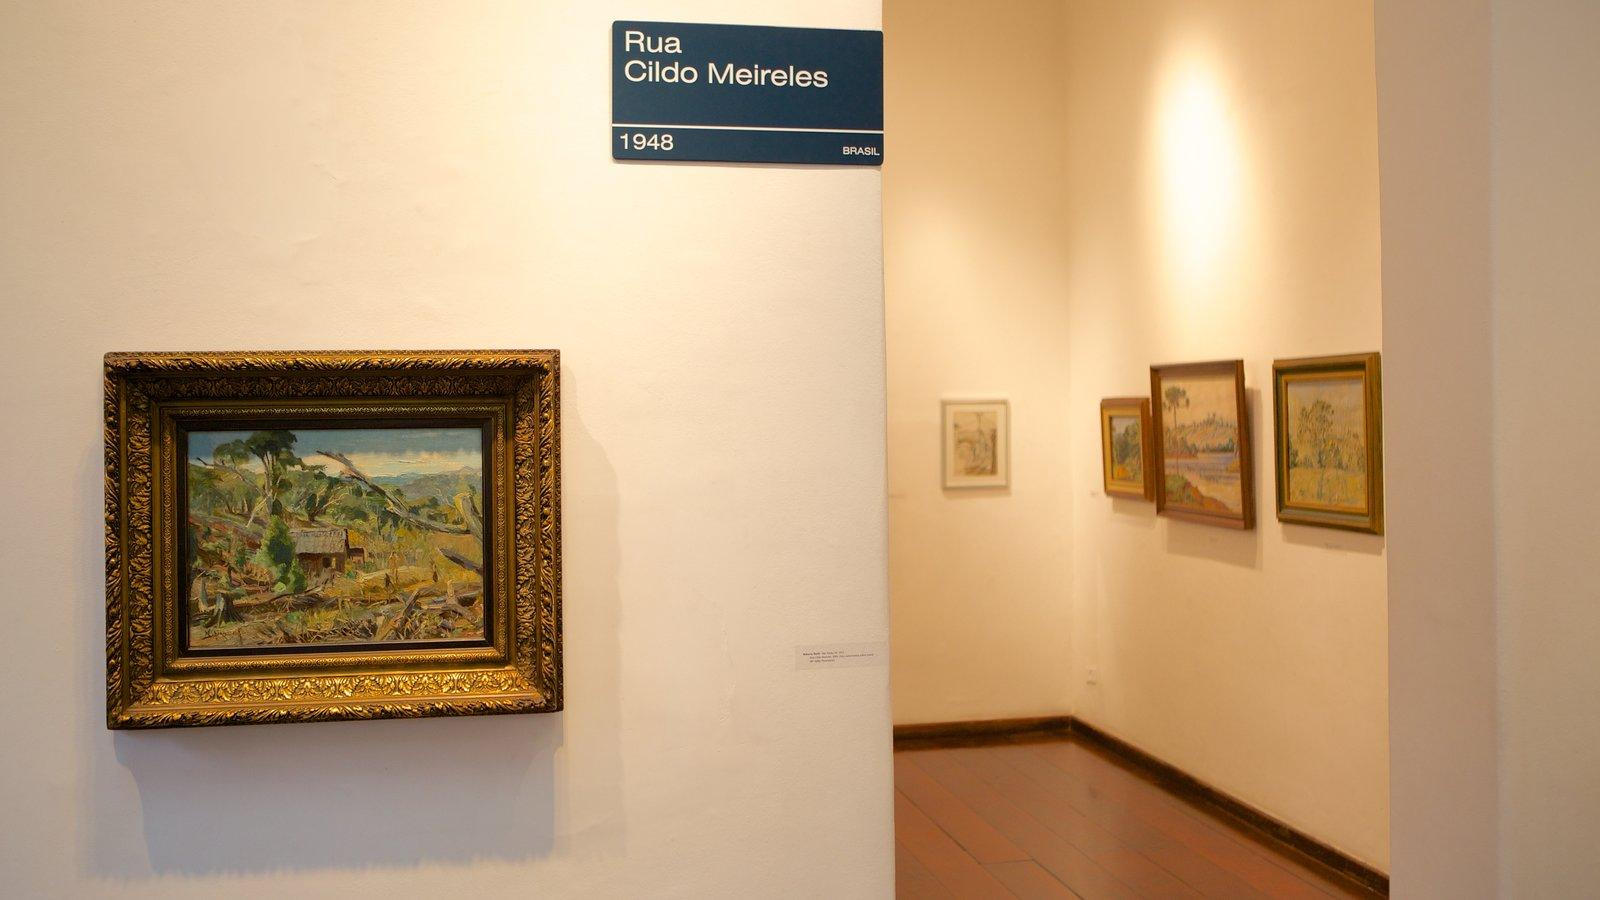 Museu de Arte Contemporânea caracterizando vistas internas e arte